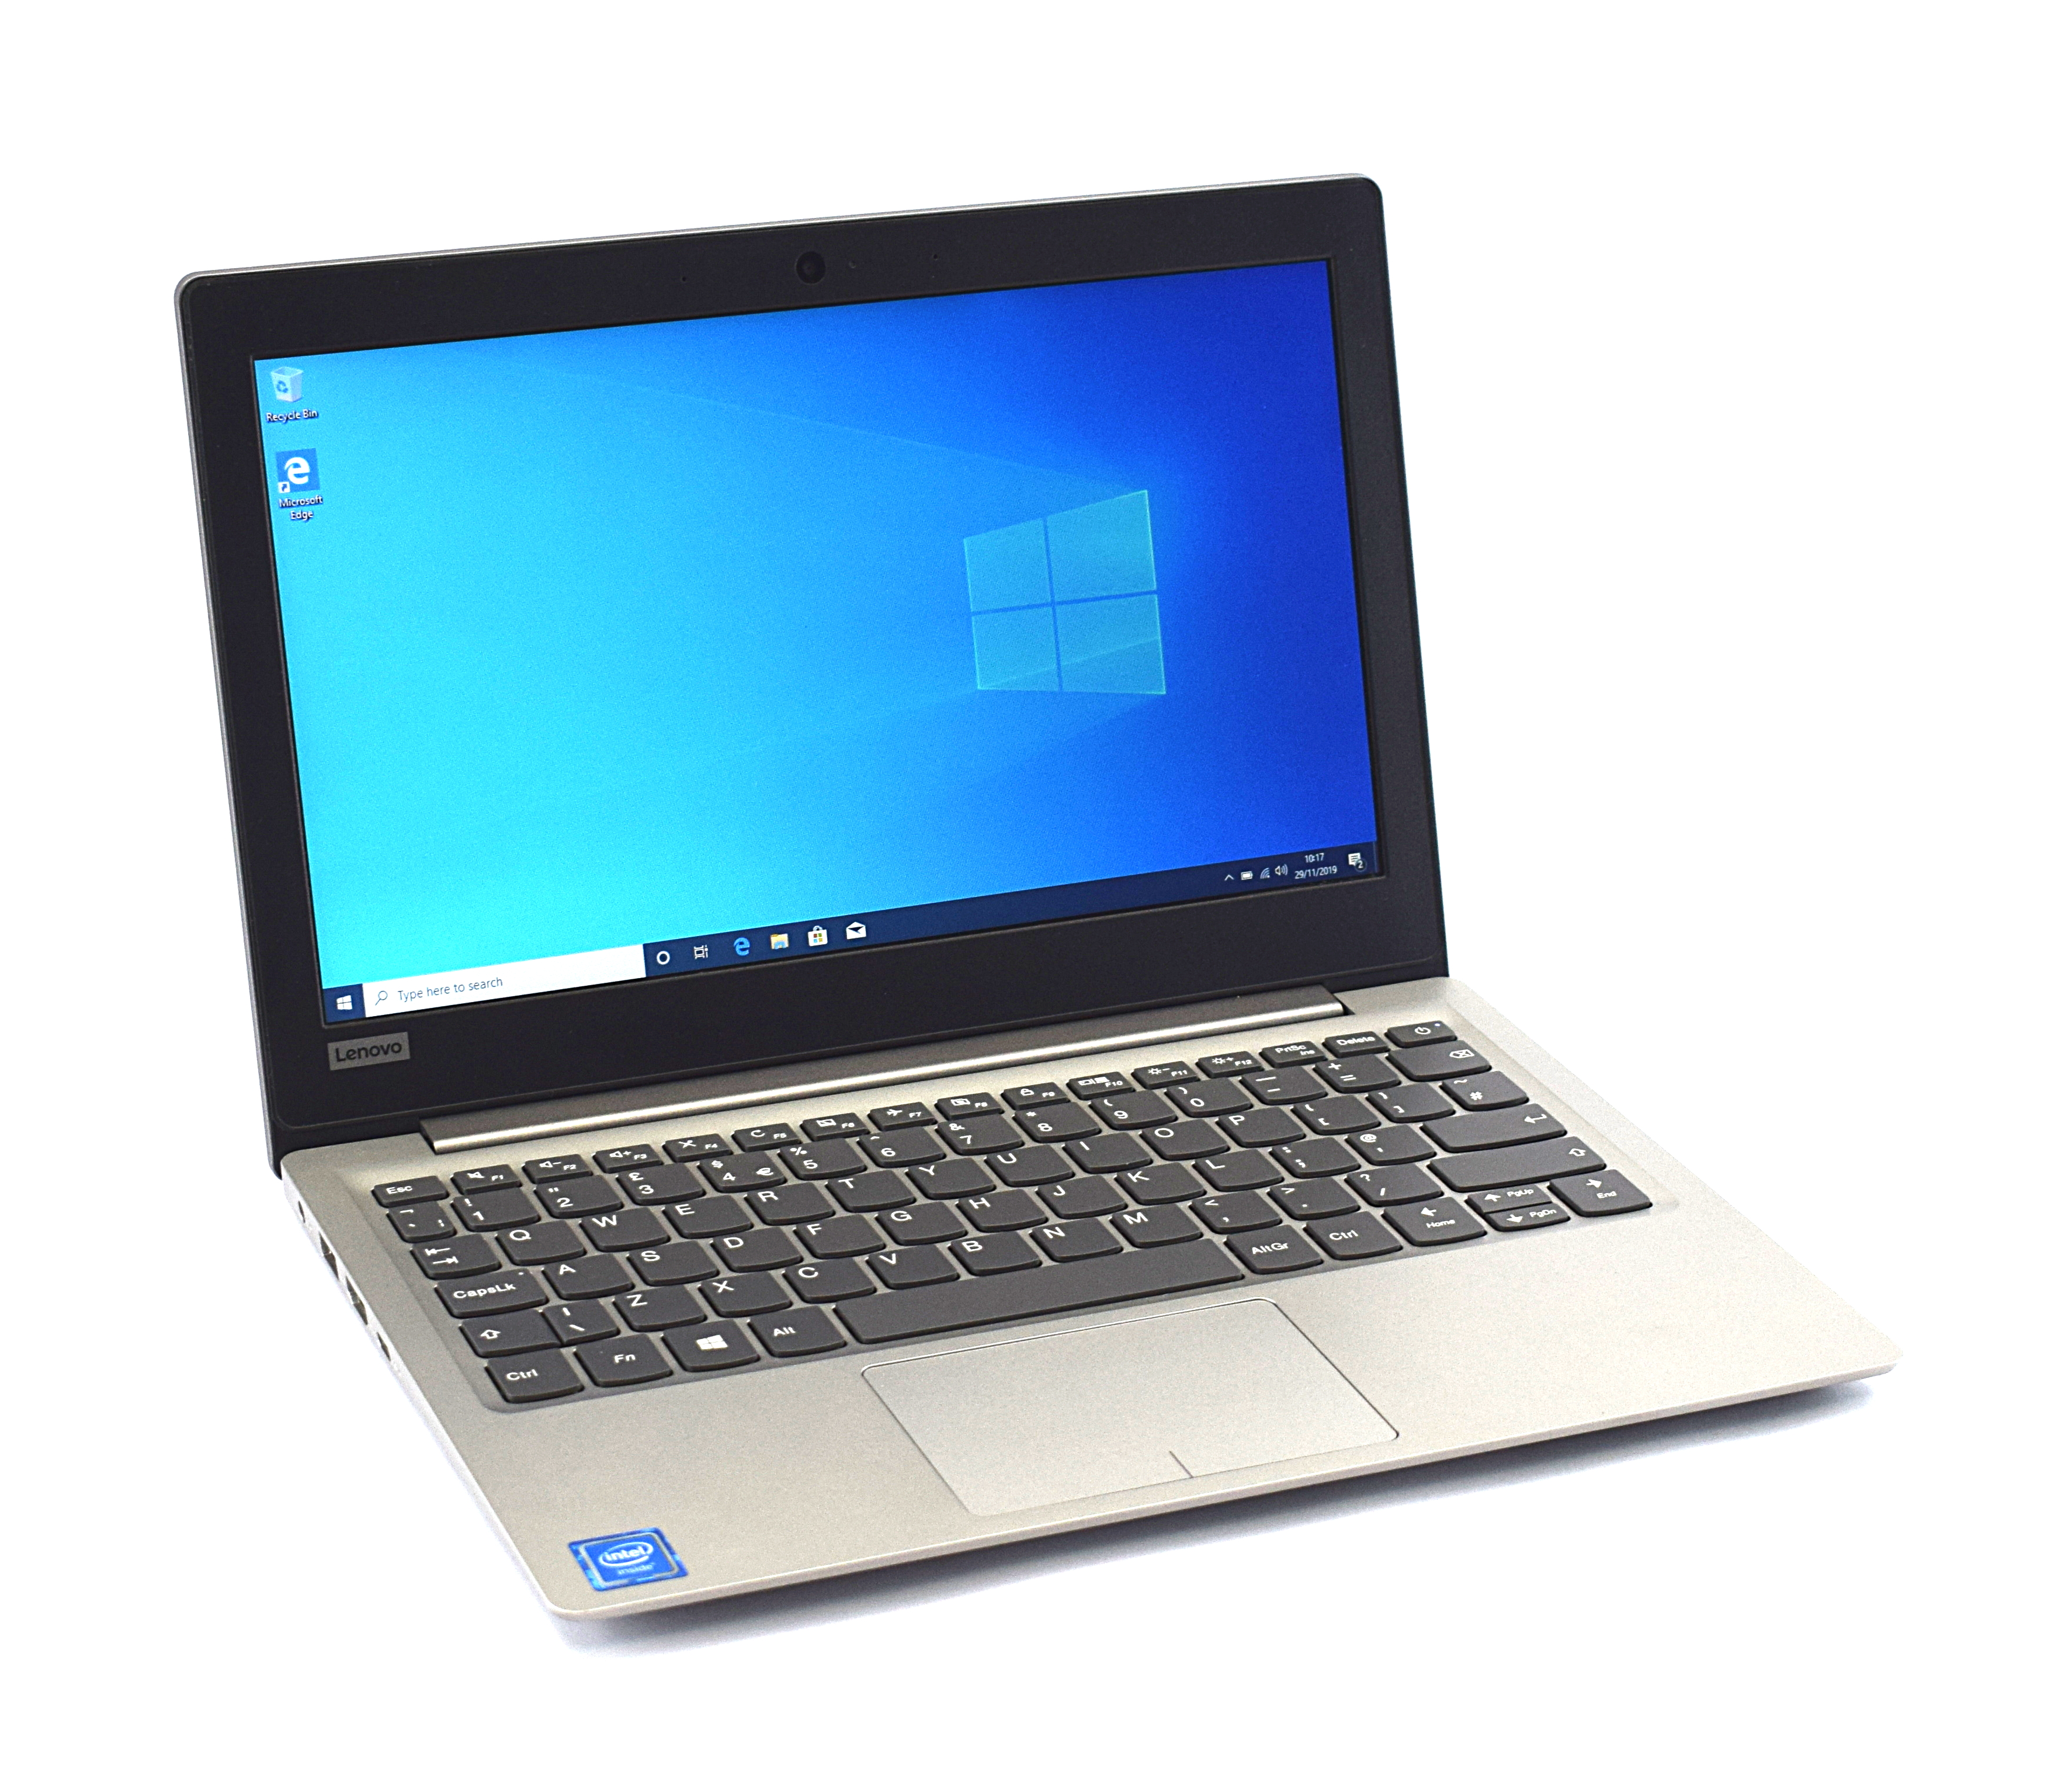 "Lenovo 120S-11IAP Laptop Intel Celeron N3350 4GB RAM 32GB eMMC 11.6"" Windows 10"